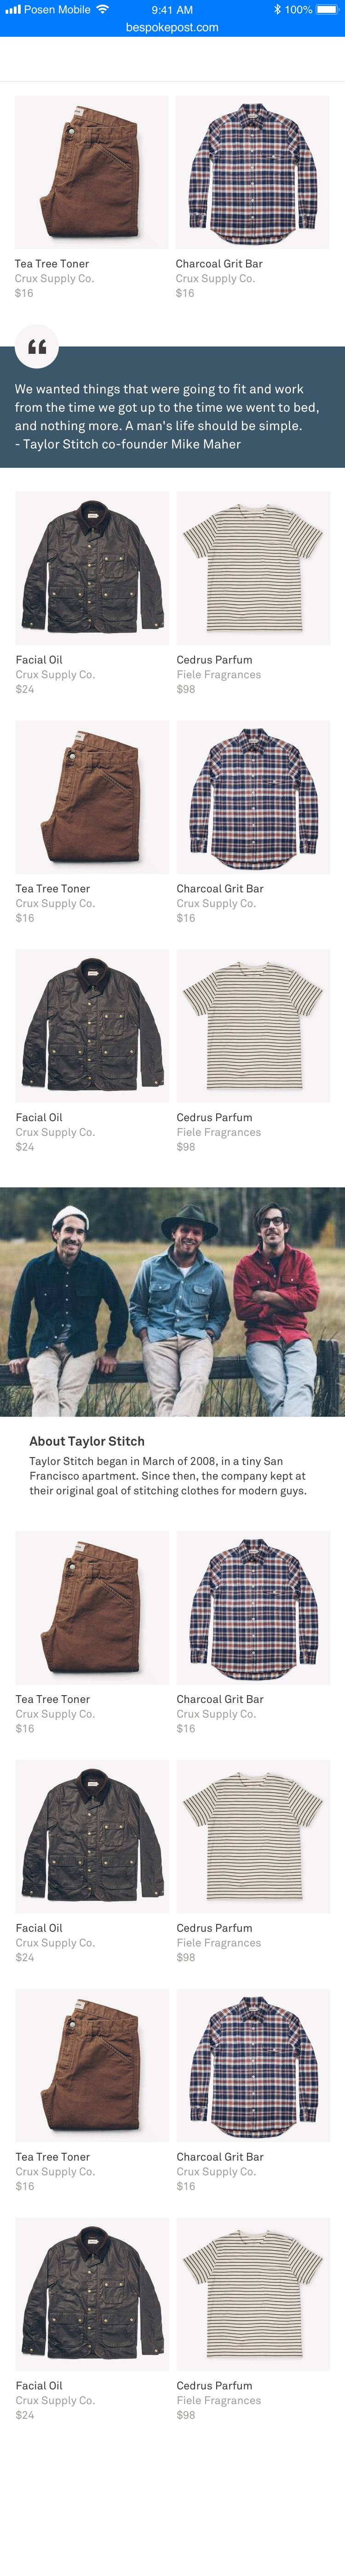 Taylor Stitch@2x.jpg